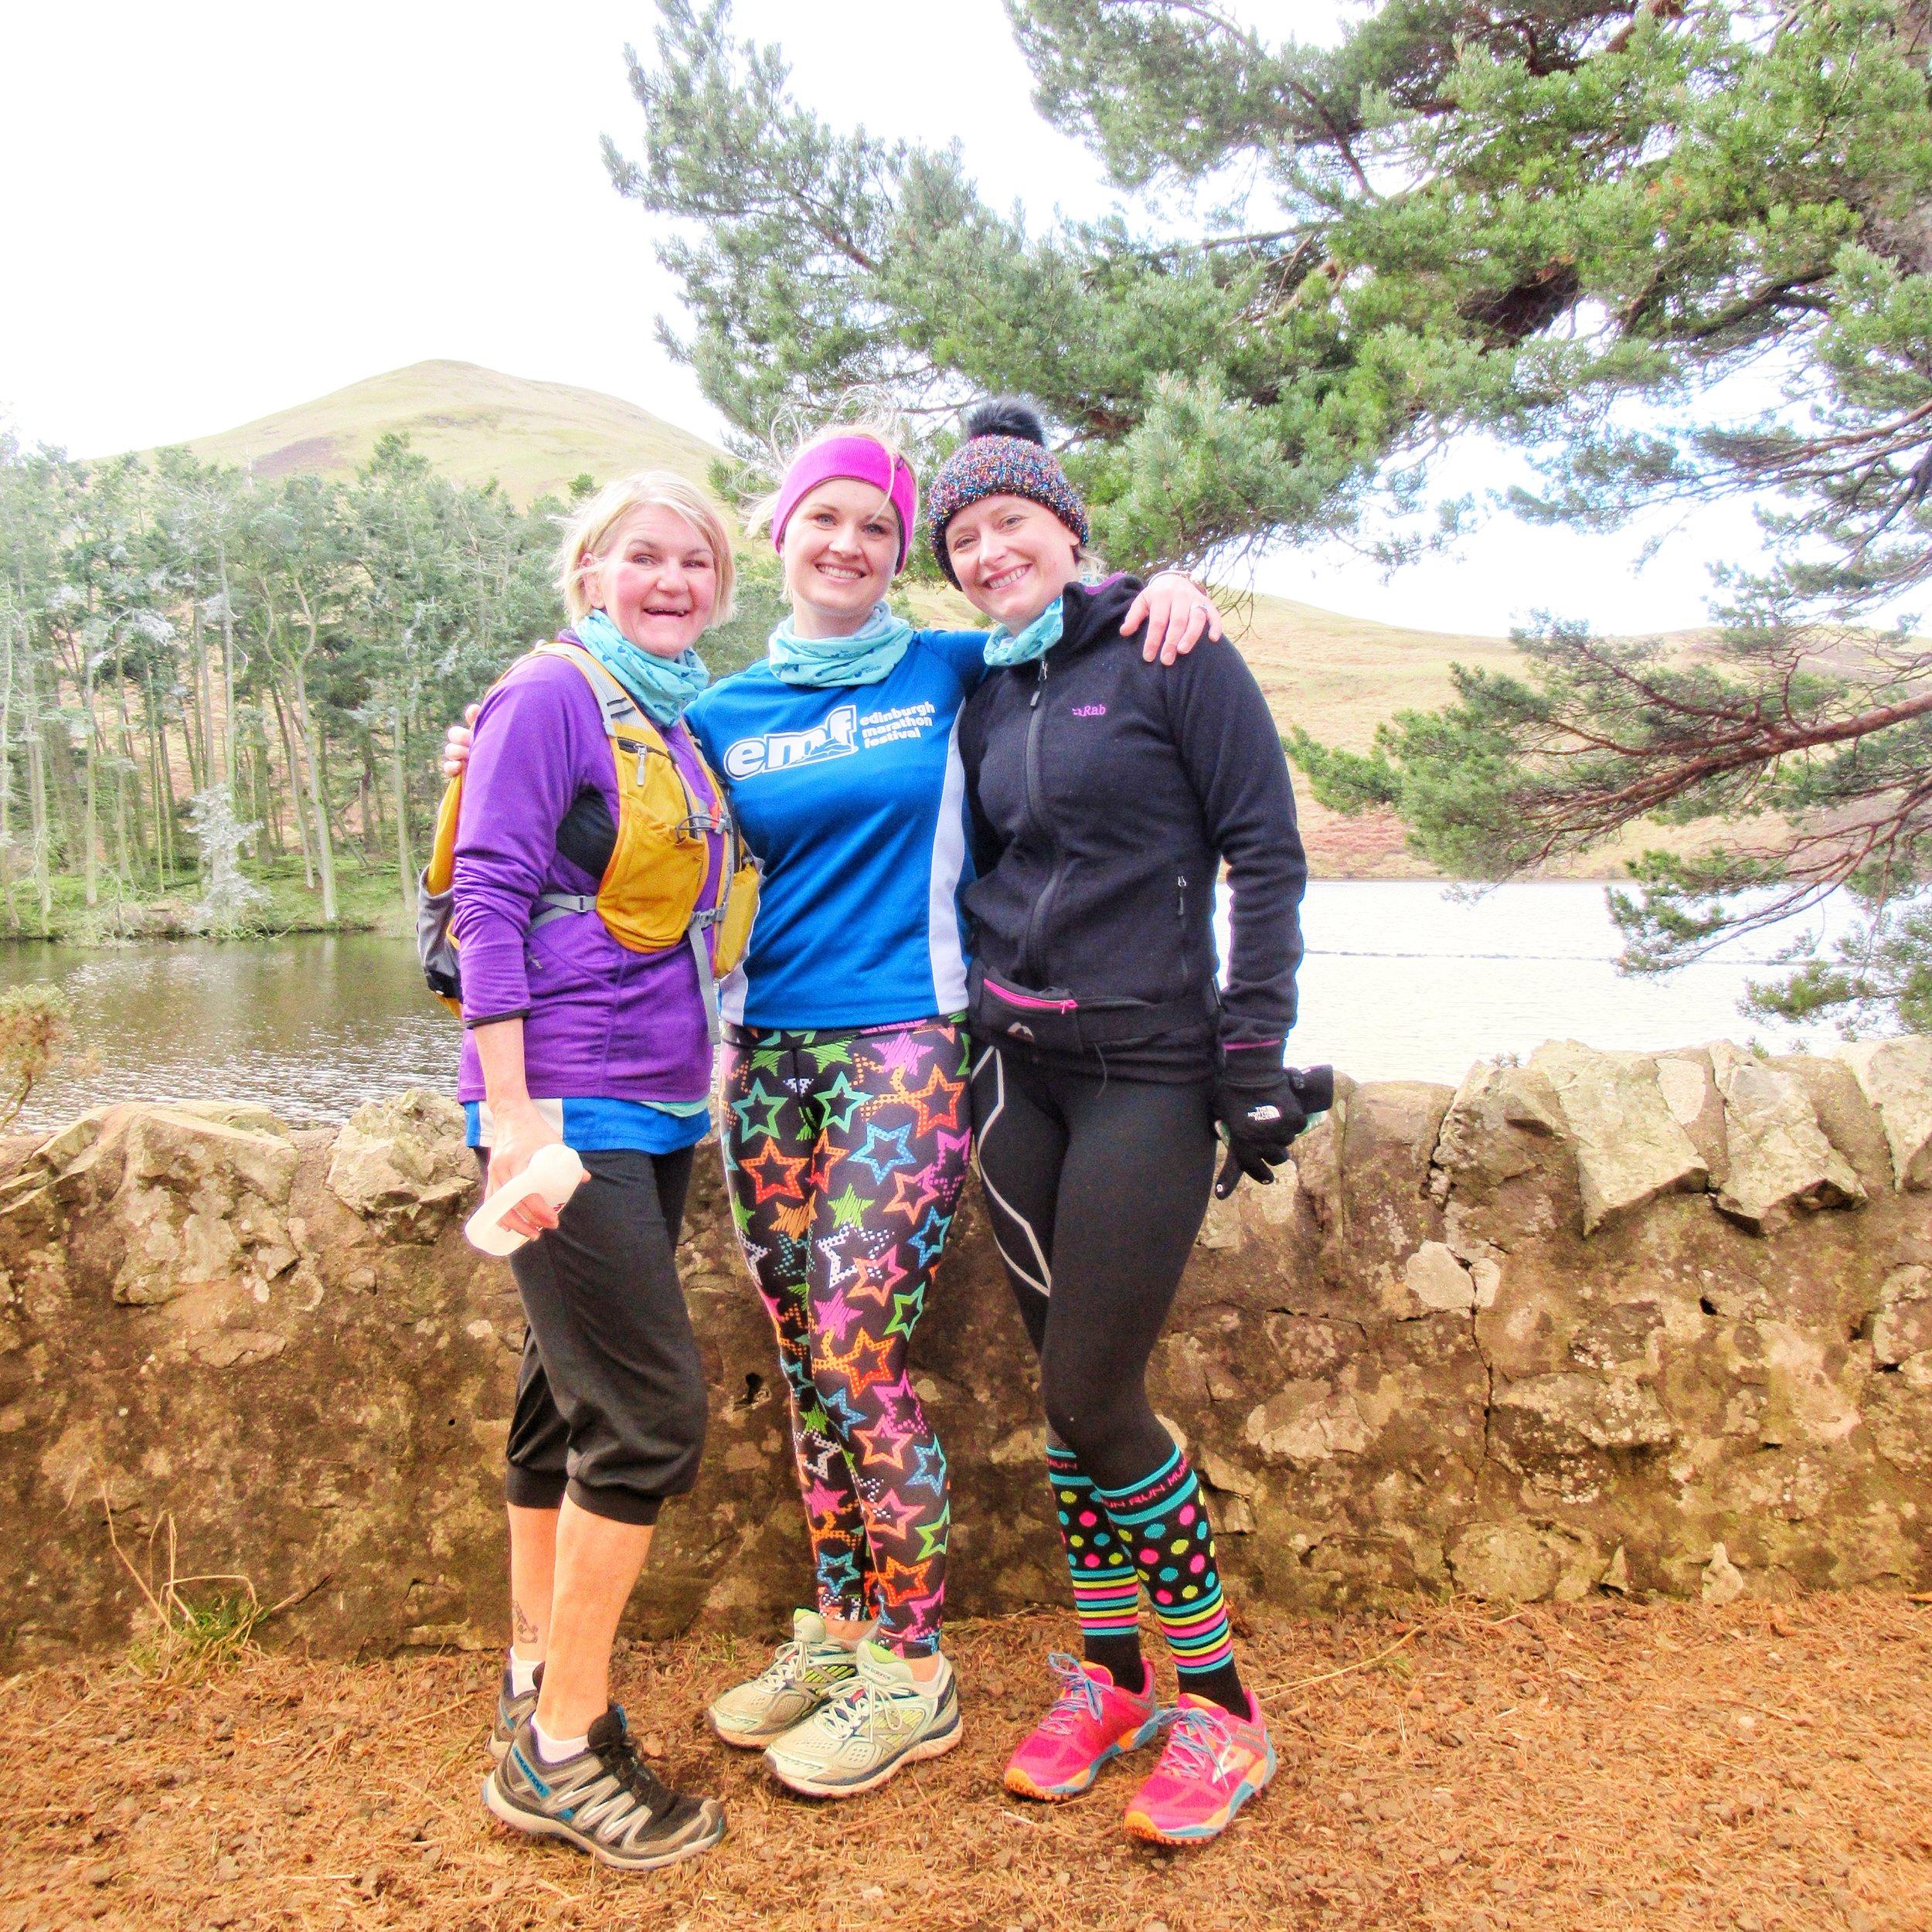 Tracy, Gemma & Angela on the Pentland Taster Running Tour